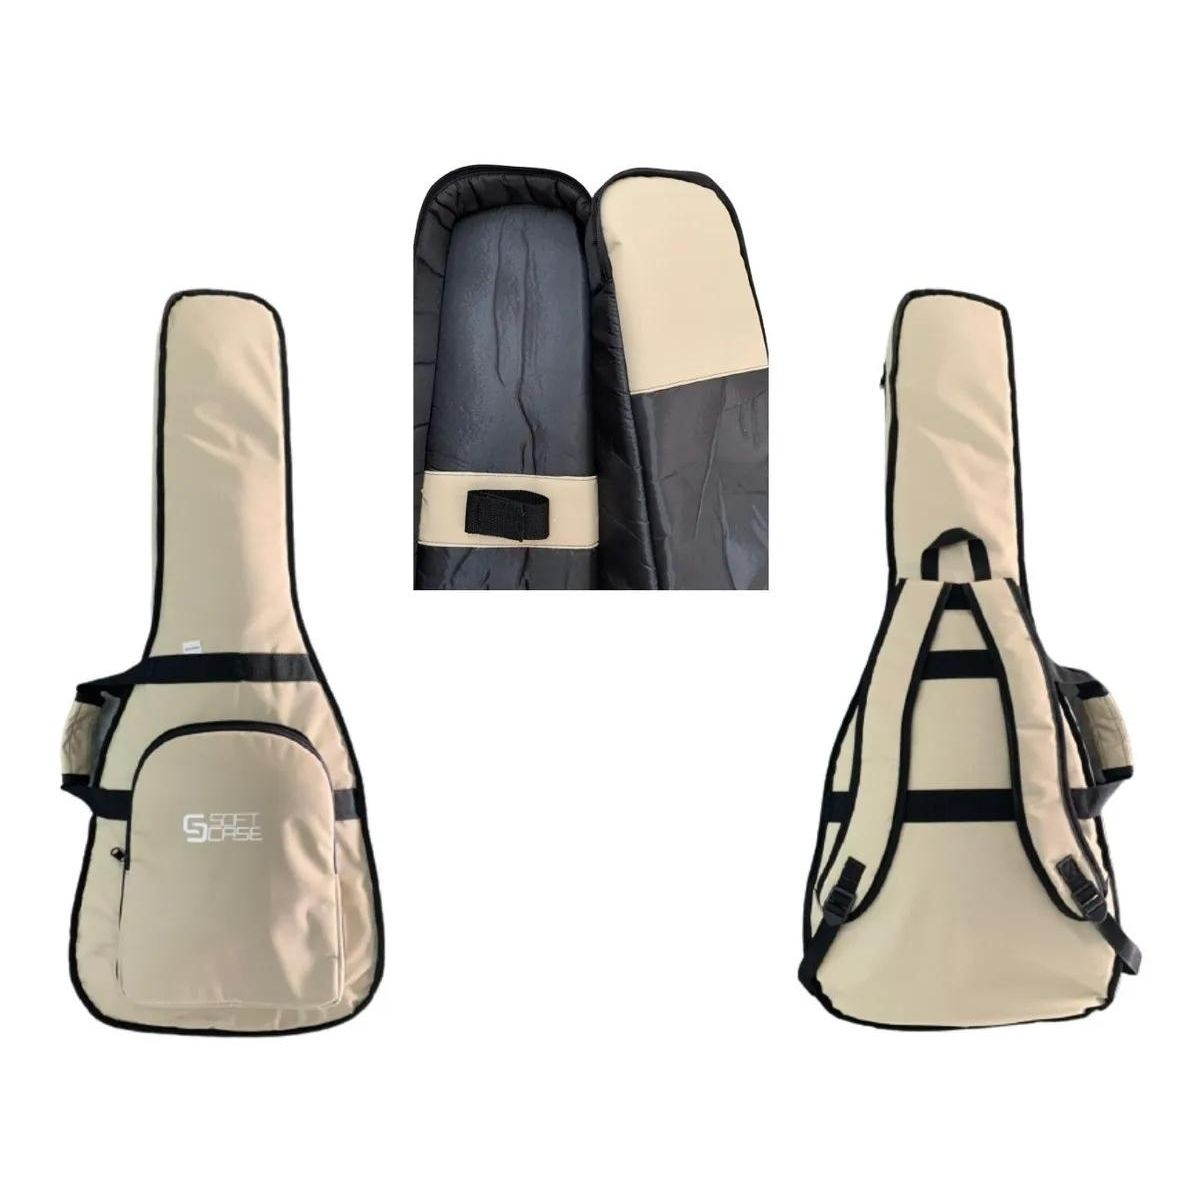 Capa Baixo Formato Acolchoada Luxo Start Soft Case